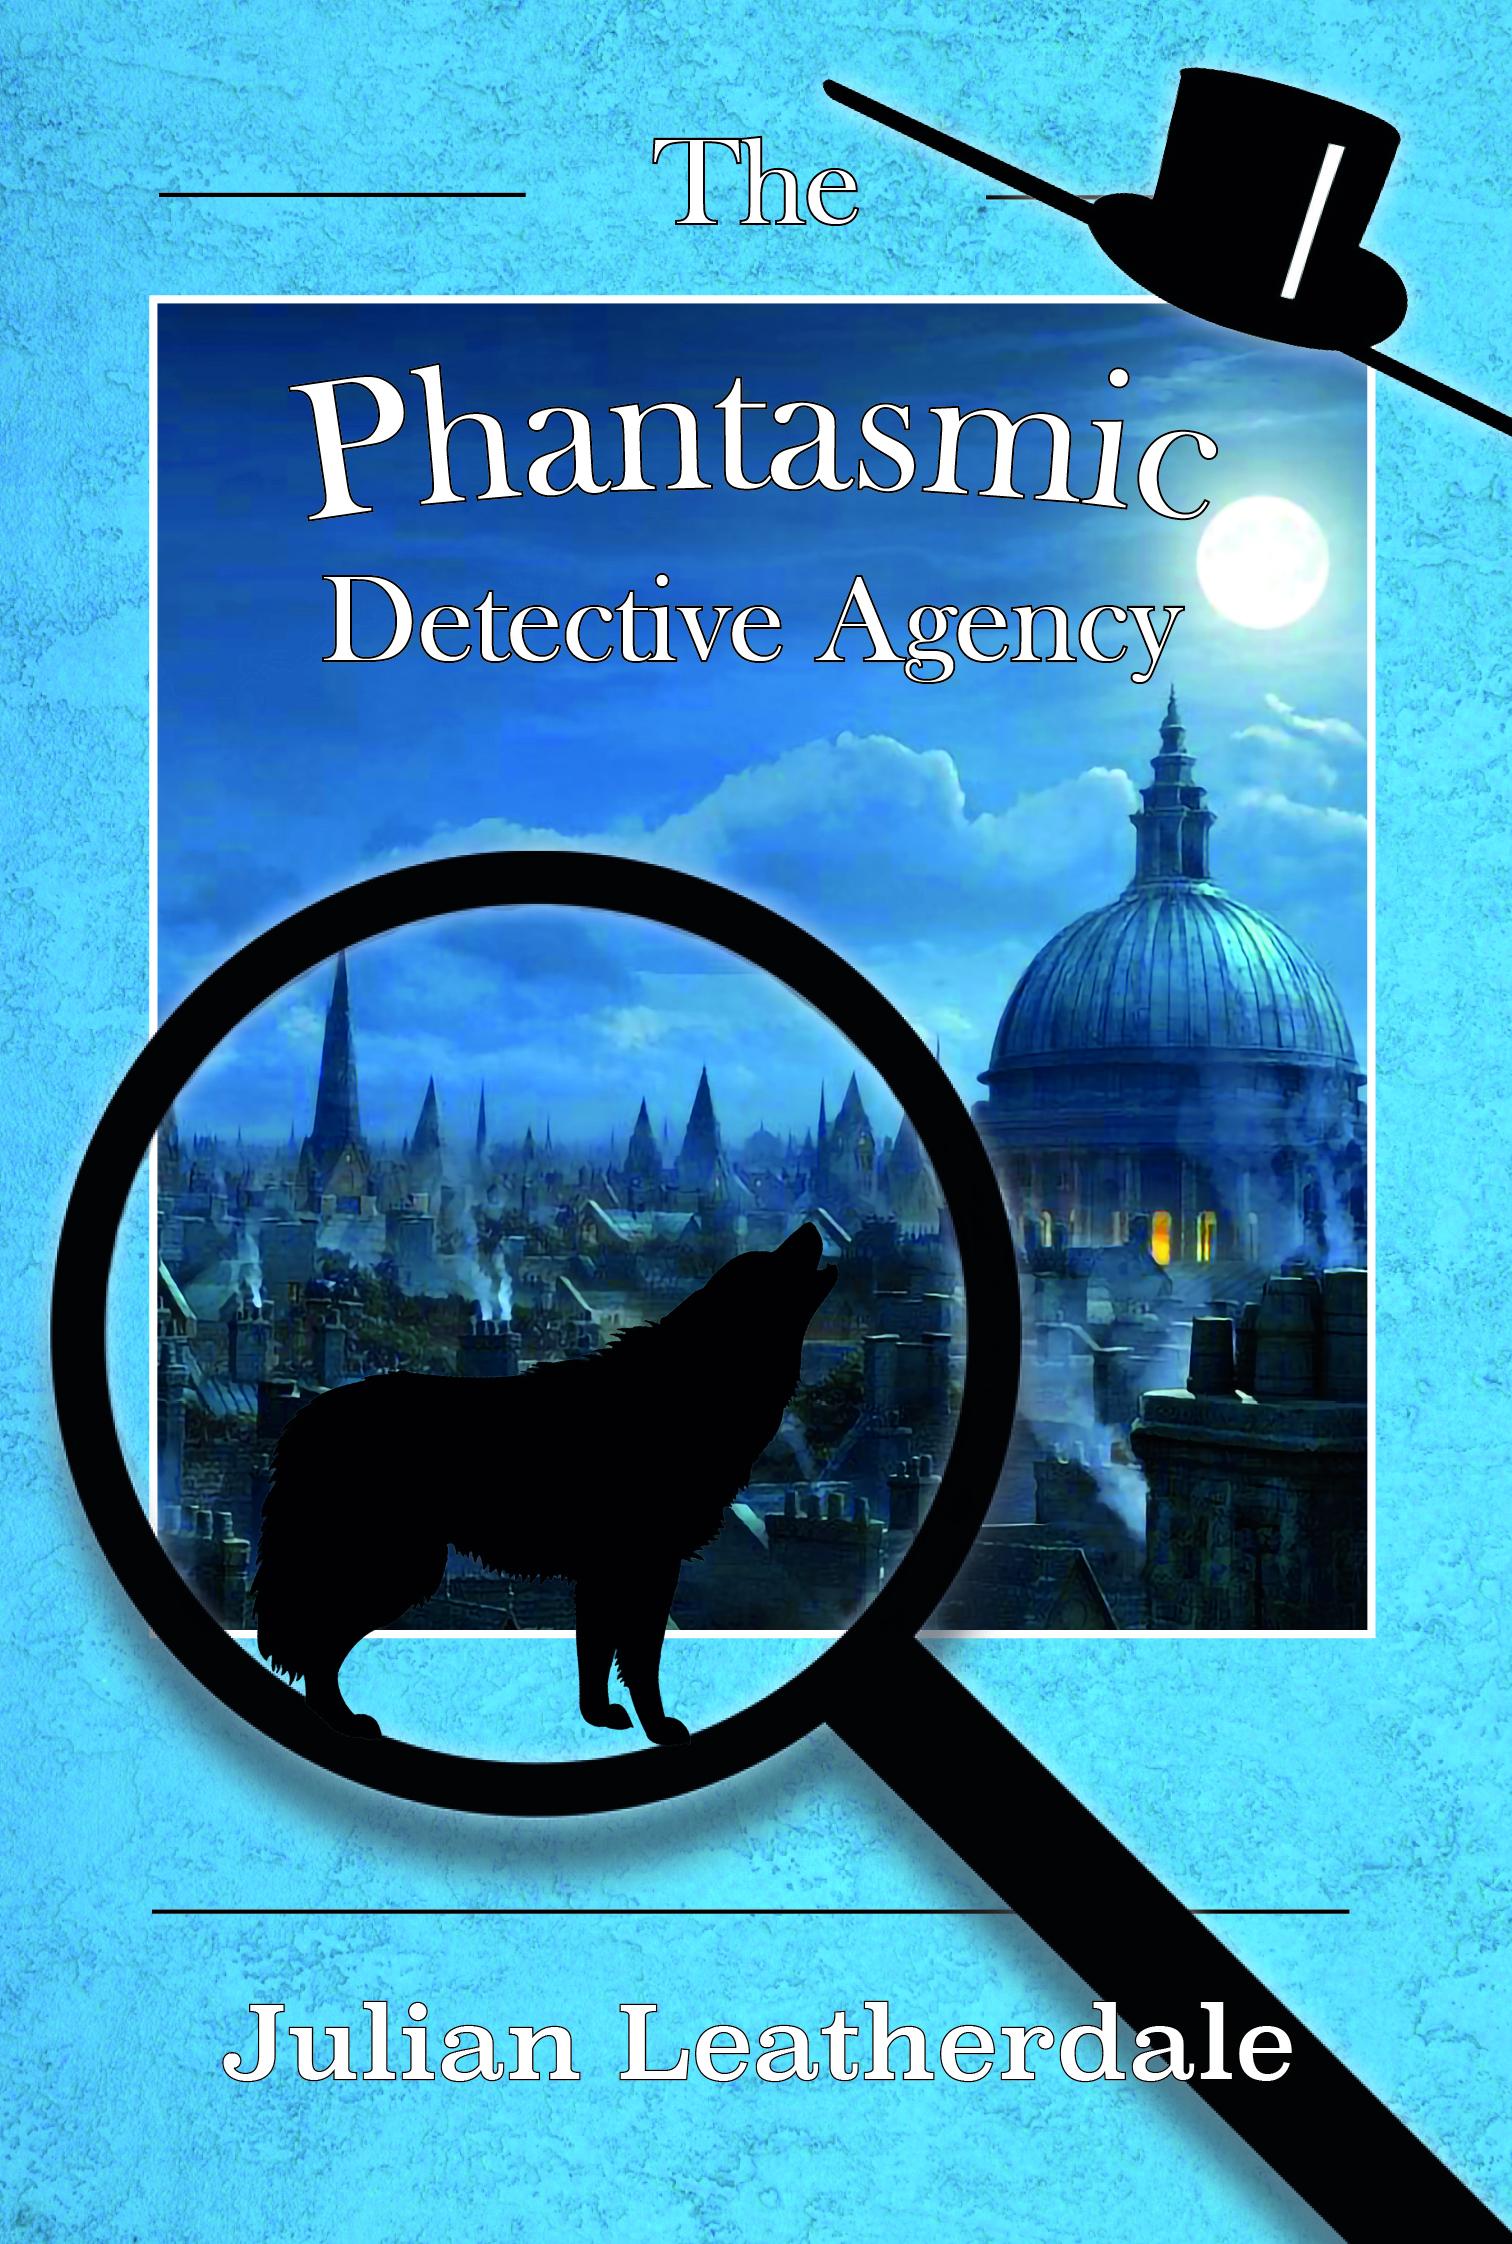 The Phantasmic Detective Agency